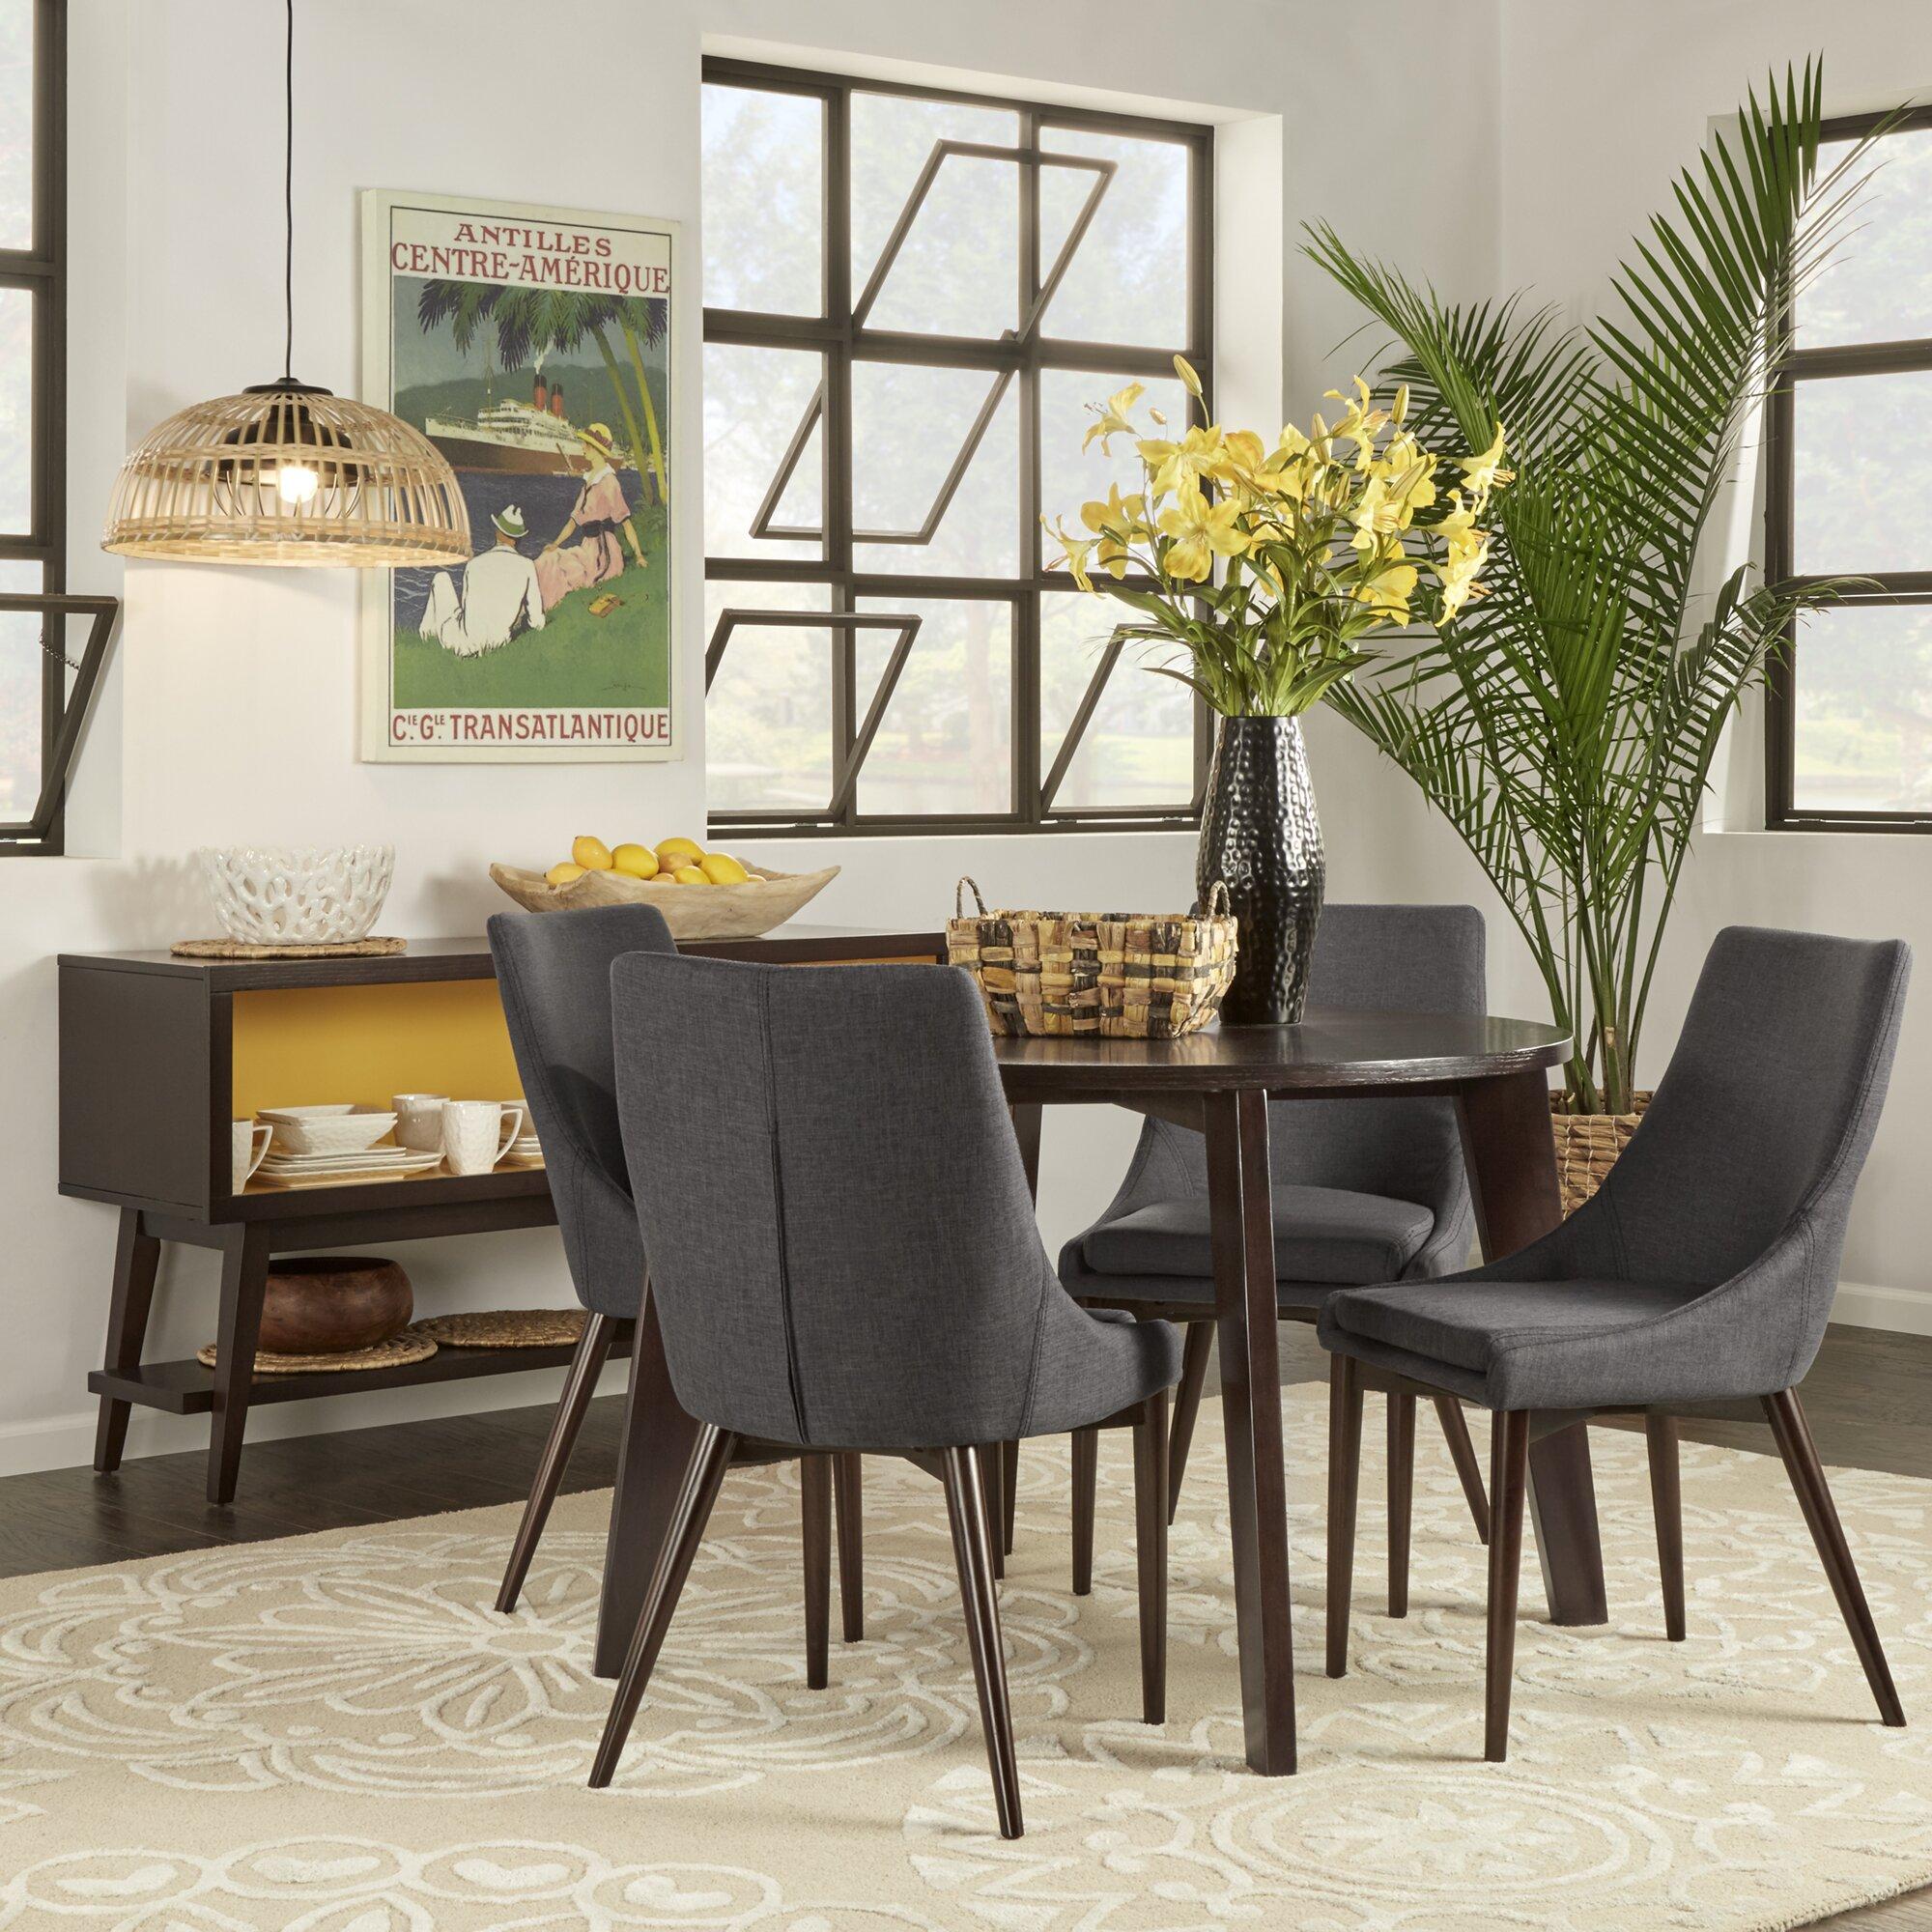 Dining Room Sets 5 Piece: 5-Piece Mayela Dining Set & Reviews